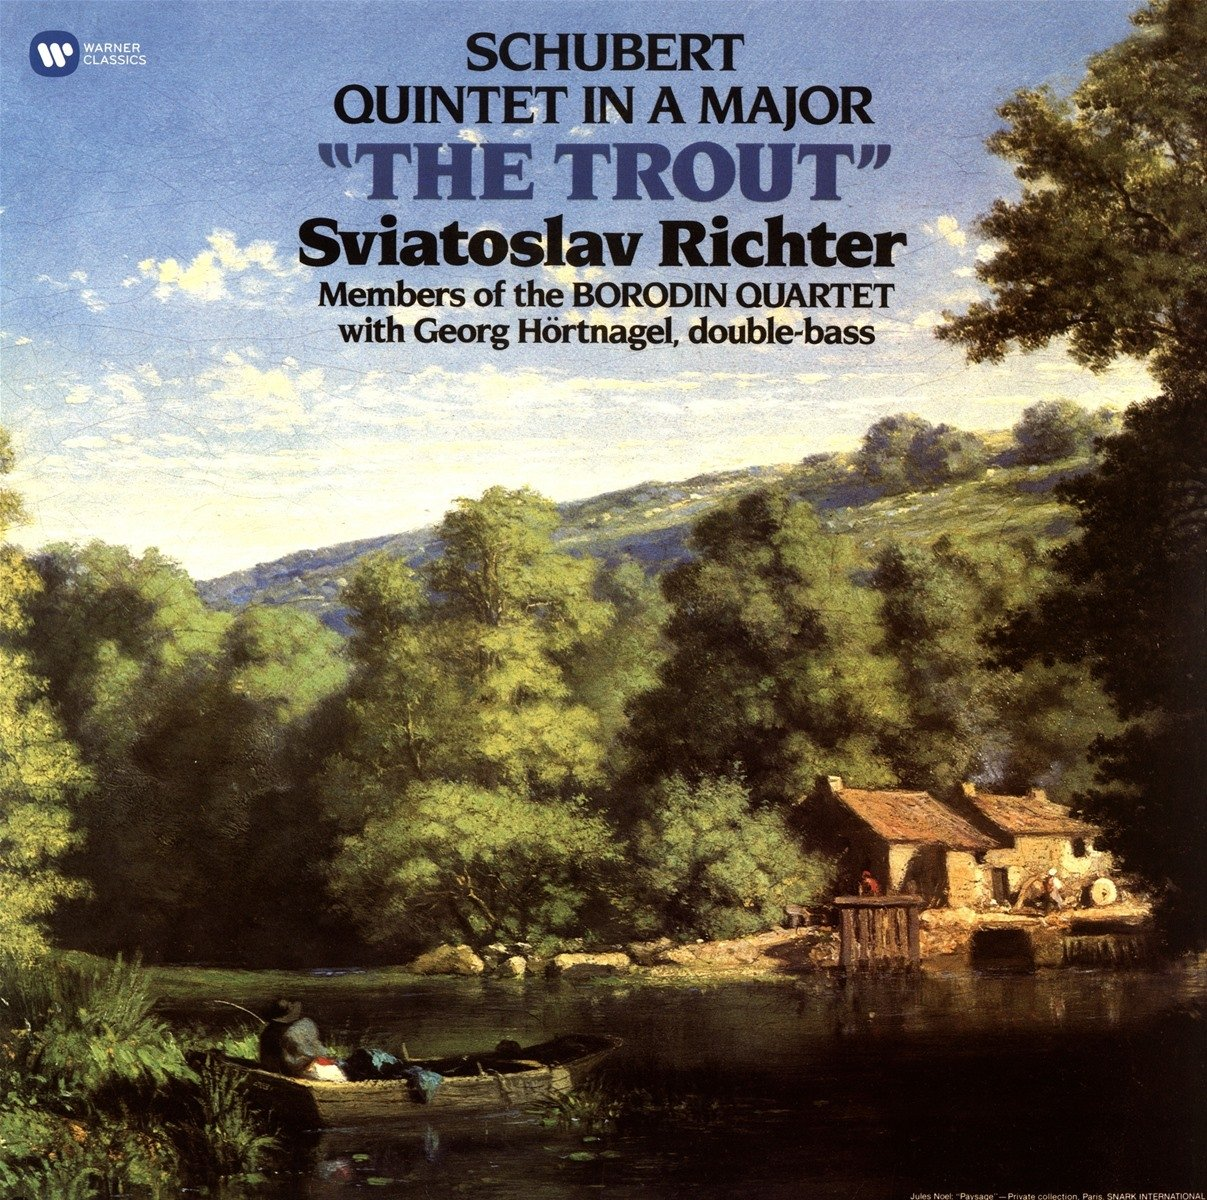 Vinilo : Sviatoslav Richter/Borodin Quartet/Georg Hörtnagel - Trout Quintet (LP Vinyl)